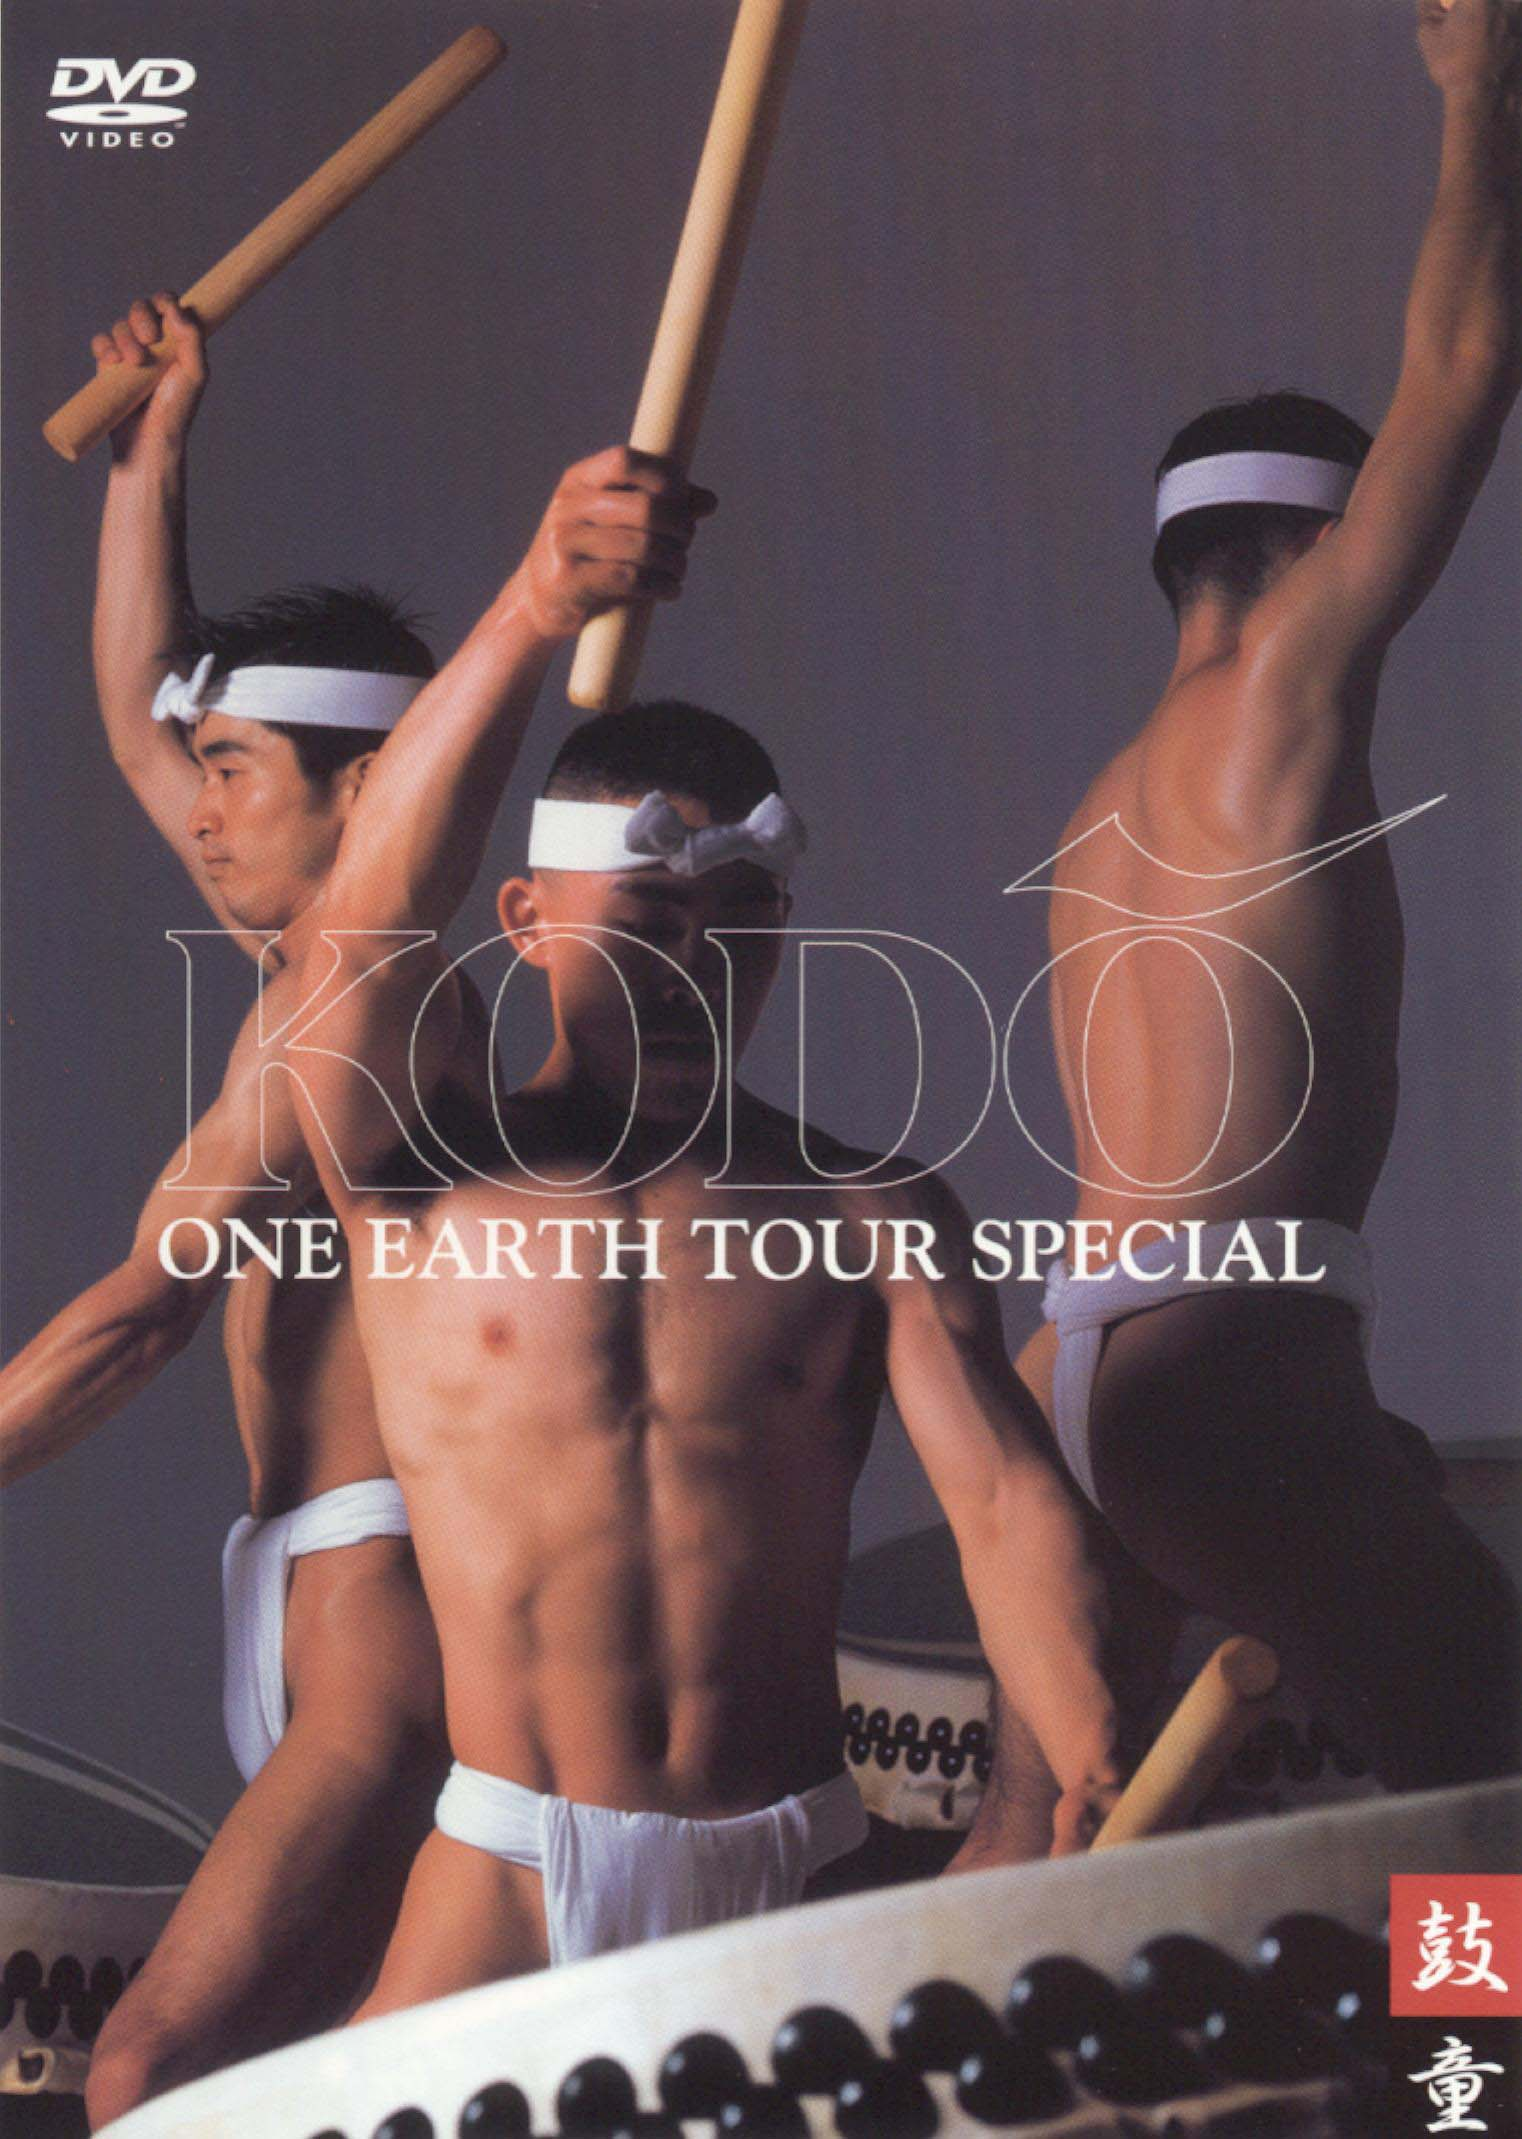 Kodo: One Earth Tour Special